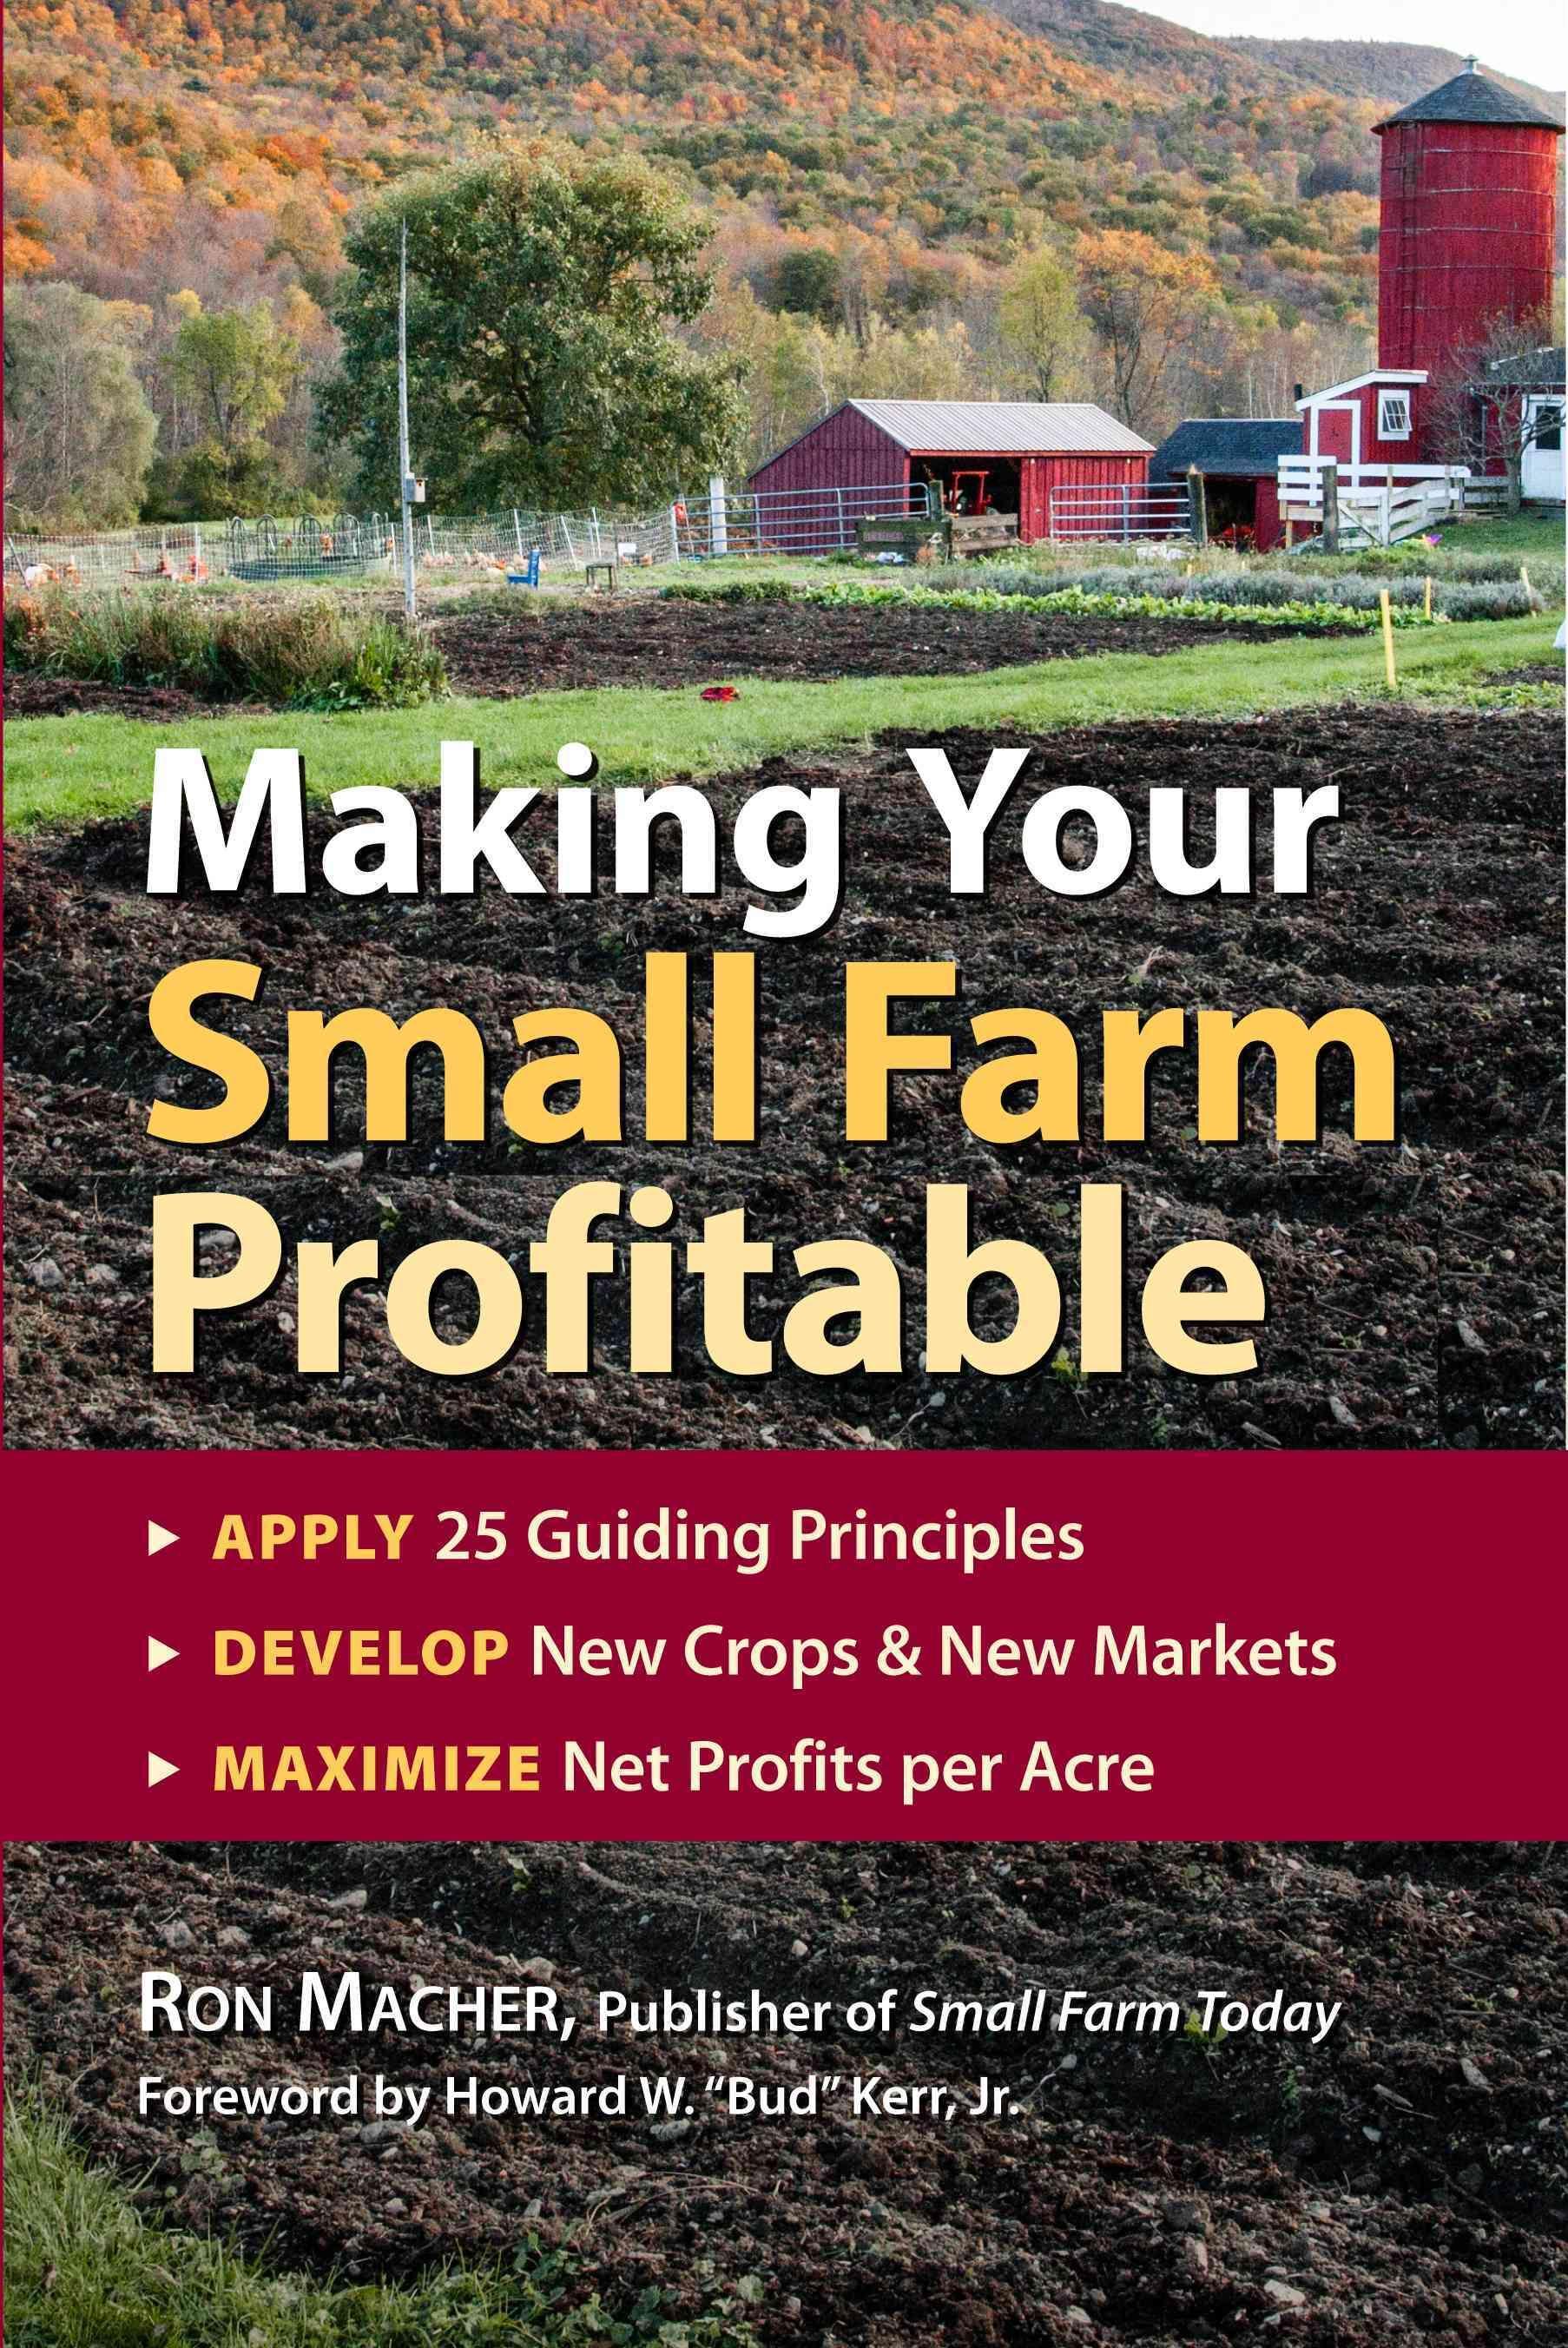 Making Your Small Farm Profitable Apply 25 Guiding Principles Develop New Crops New Markets Maximize Net Profi Paperback Small Farm Farm Business Farm Is backyard farming profitable